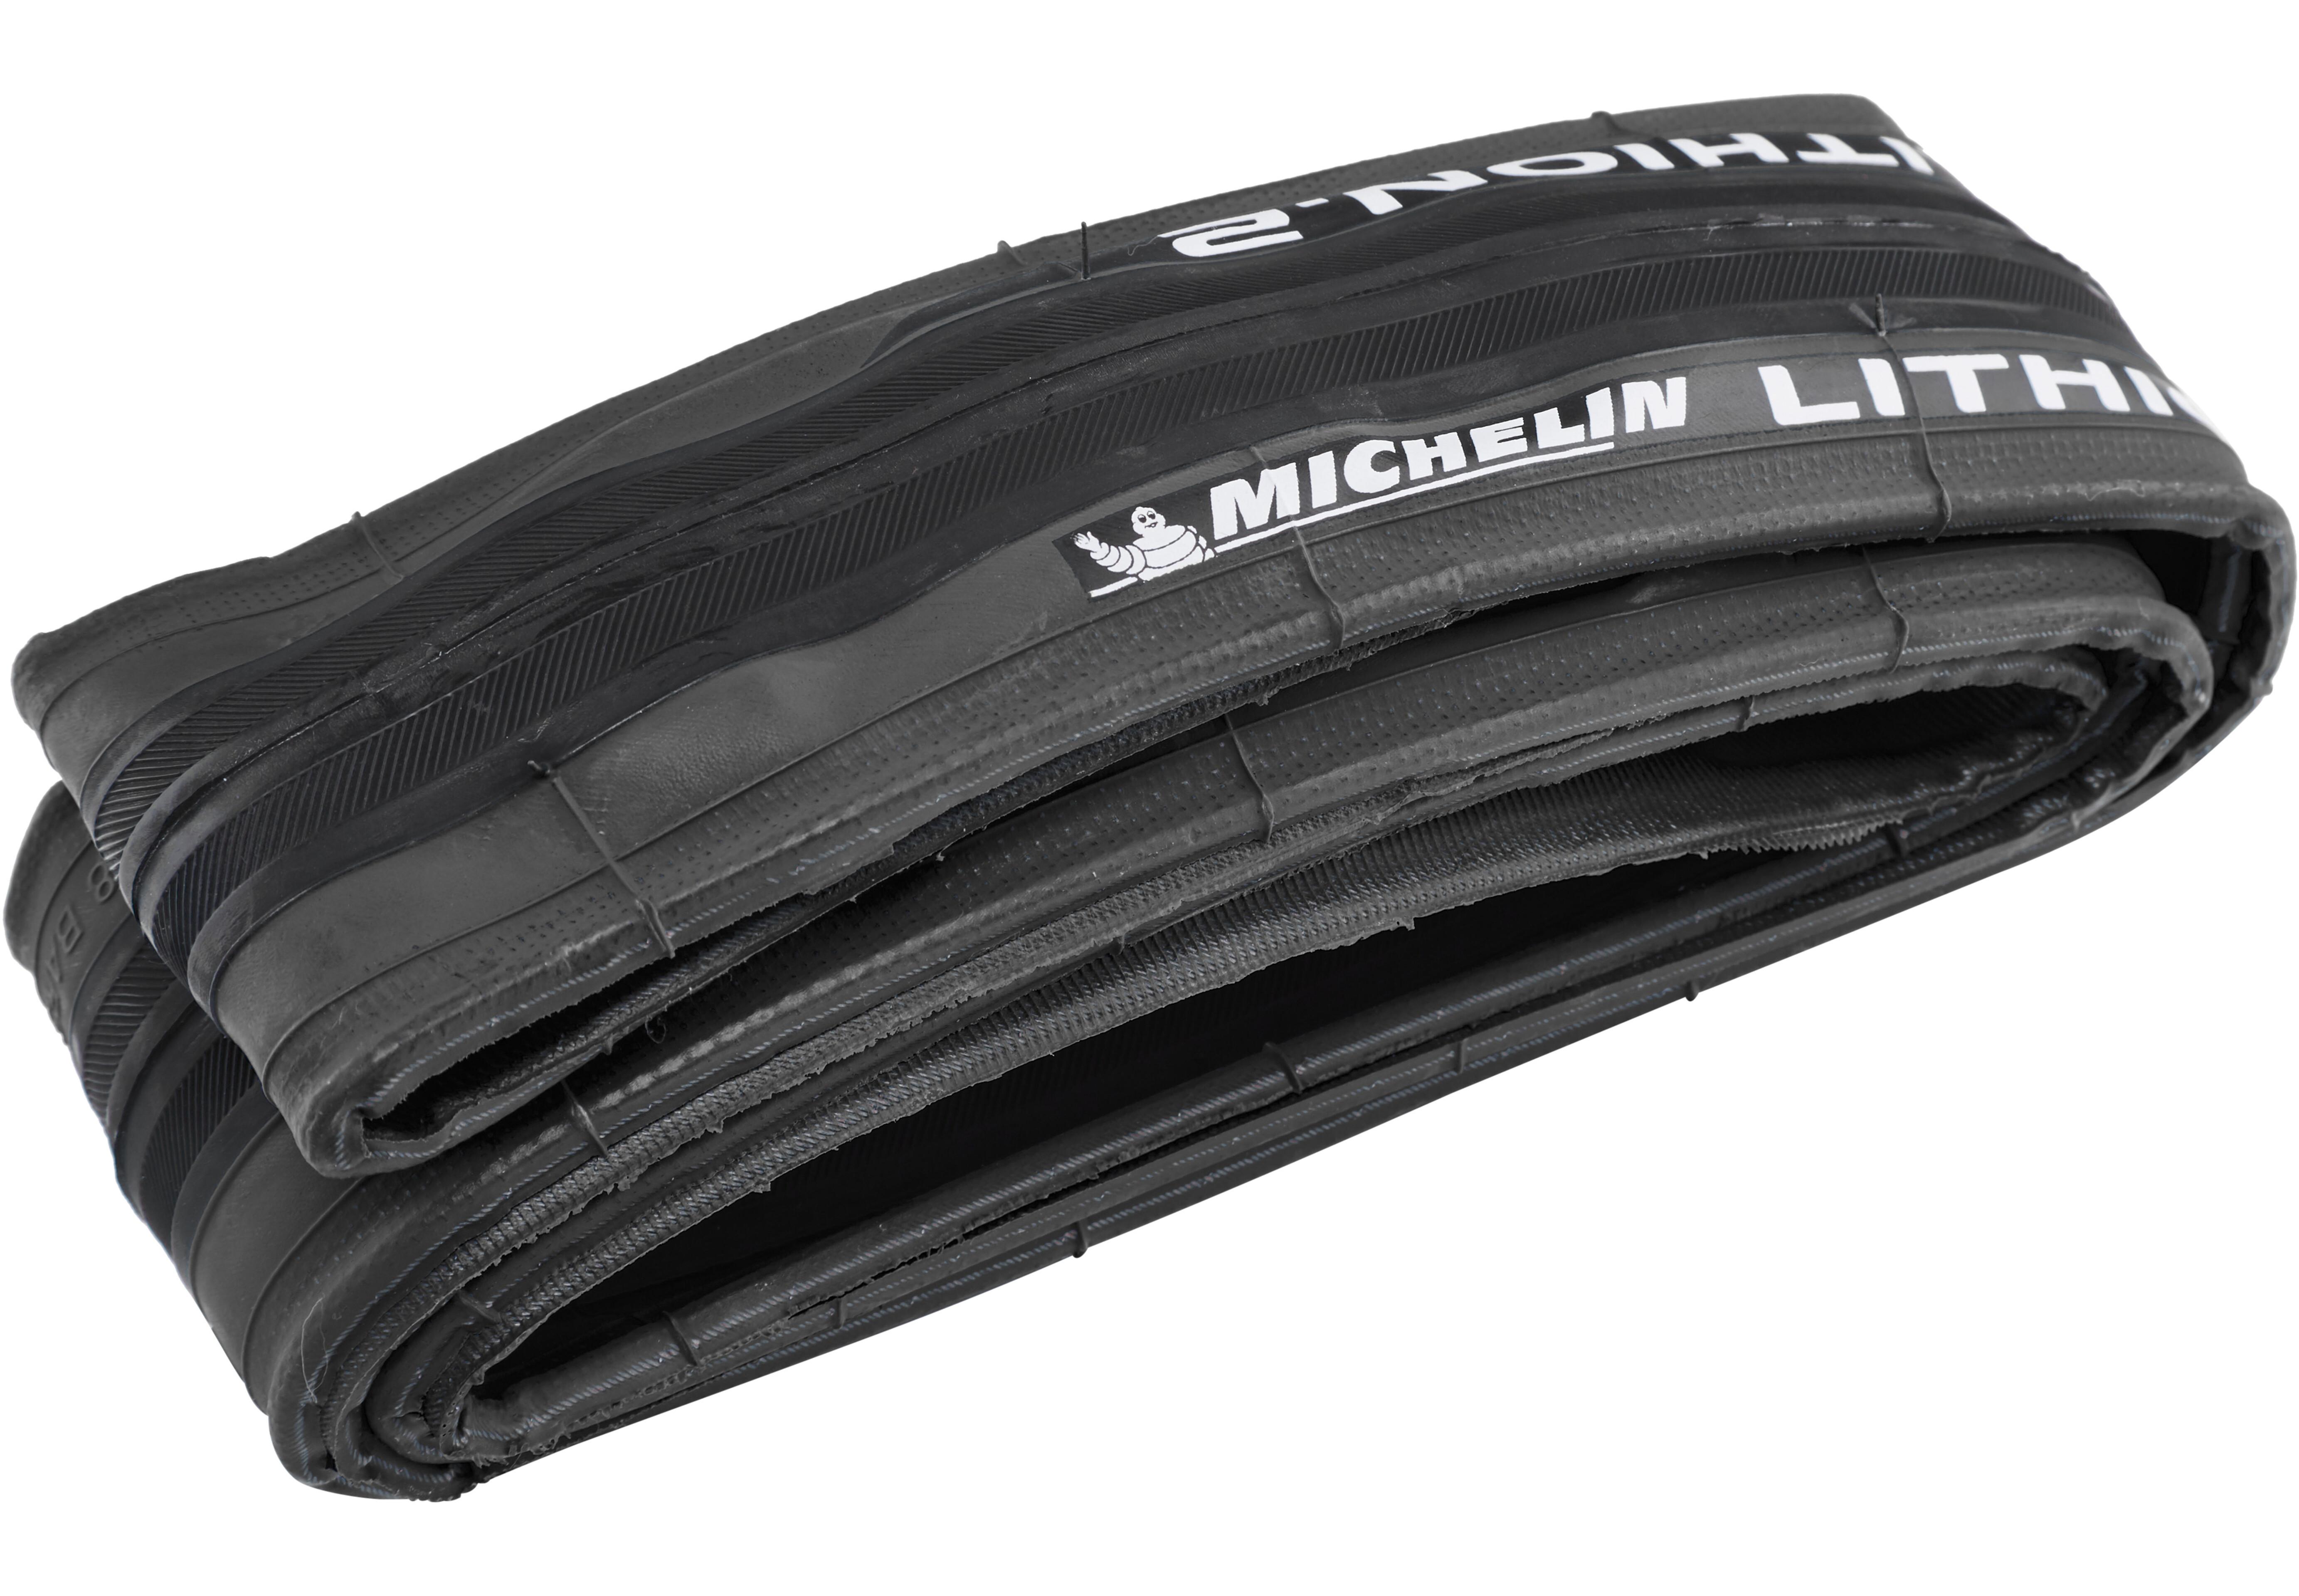 michelin lithion 2 cykeld ck 28 gr svart till fenomenalt pris p bikester. Black Bedroom Furniture Sets. Home Design Ideas